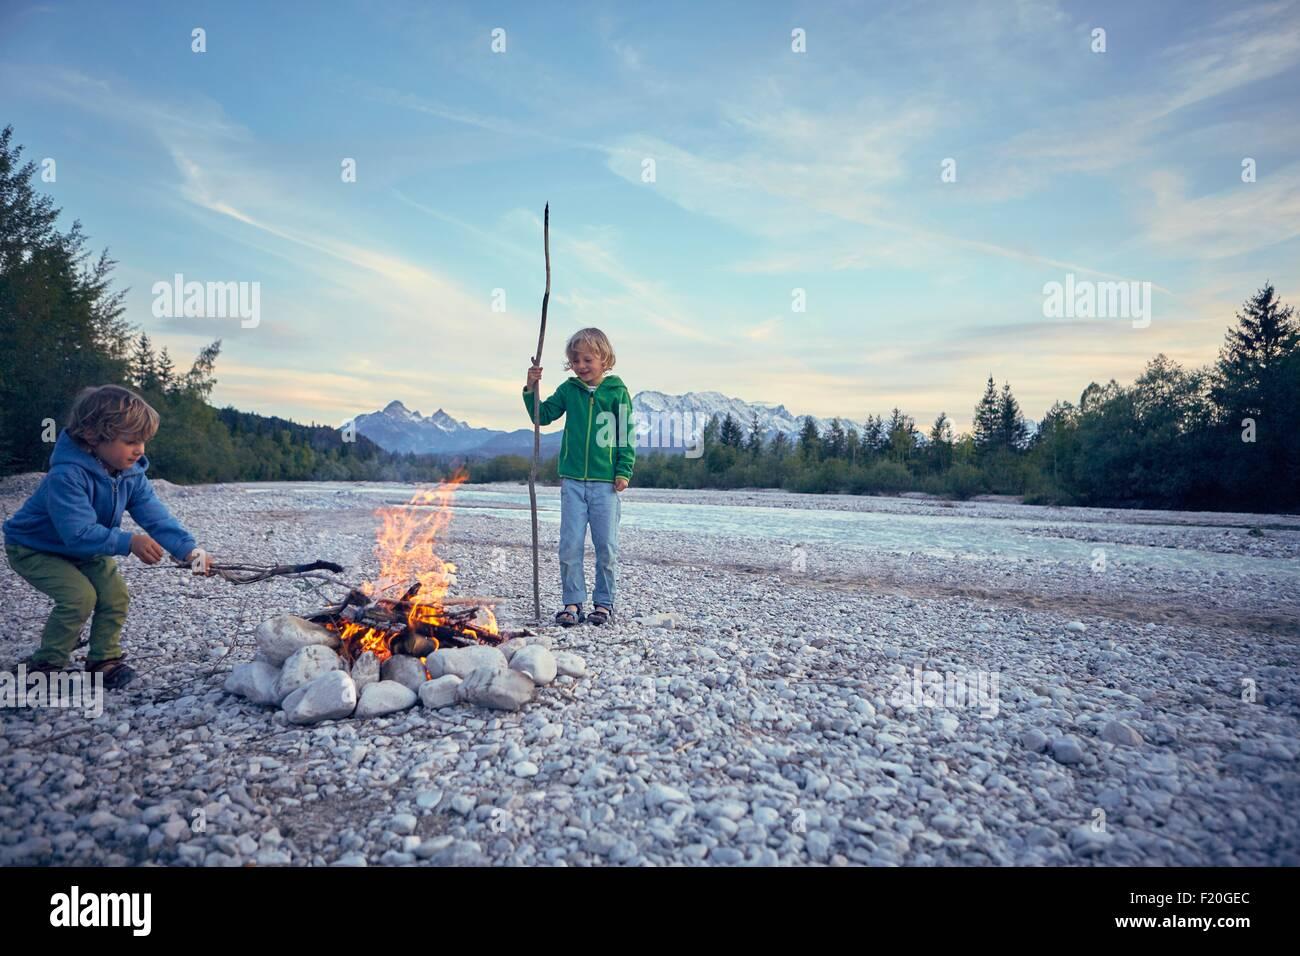 Boys poking campfire with sticks, Wallgau, Bavaria, Germany - Stock Image